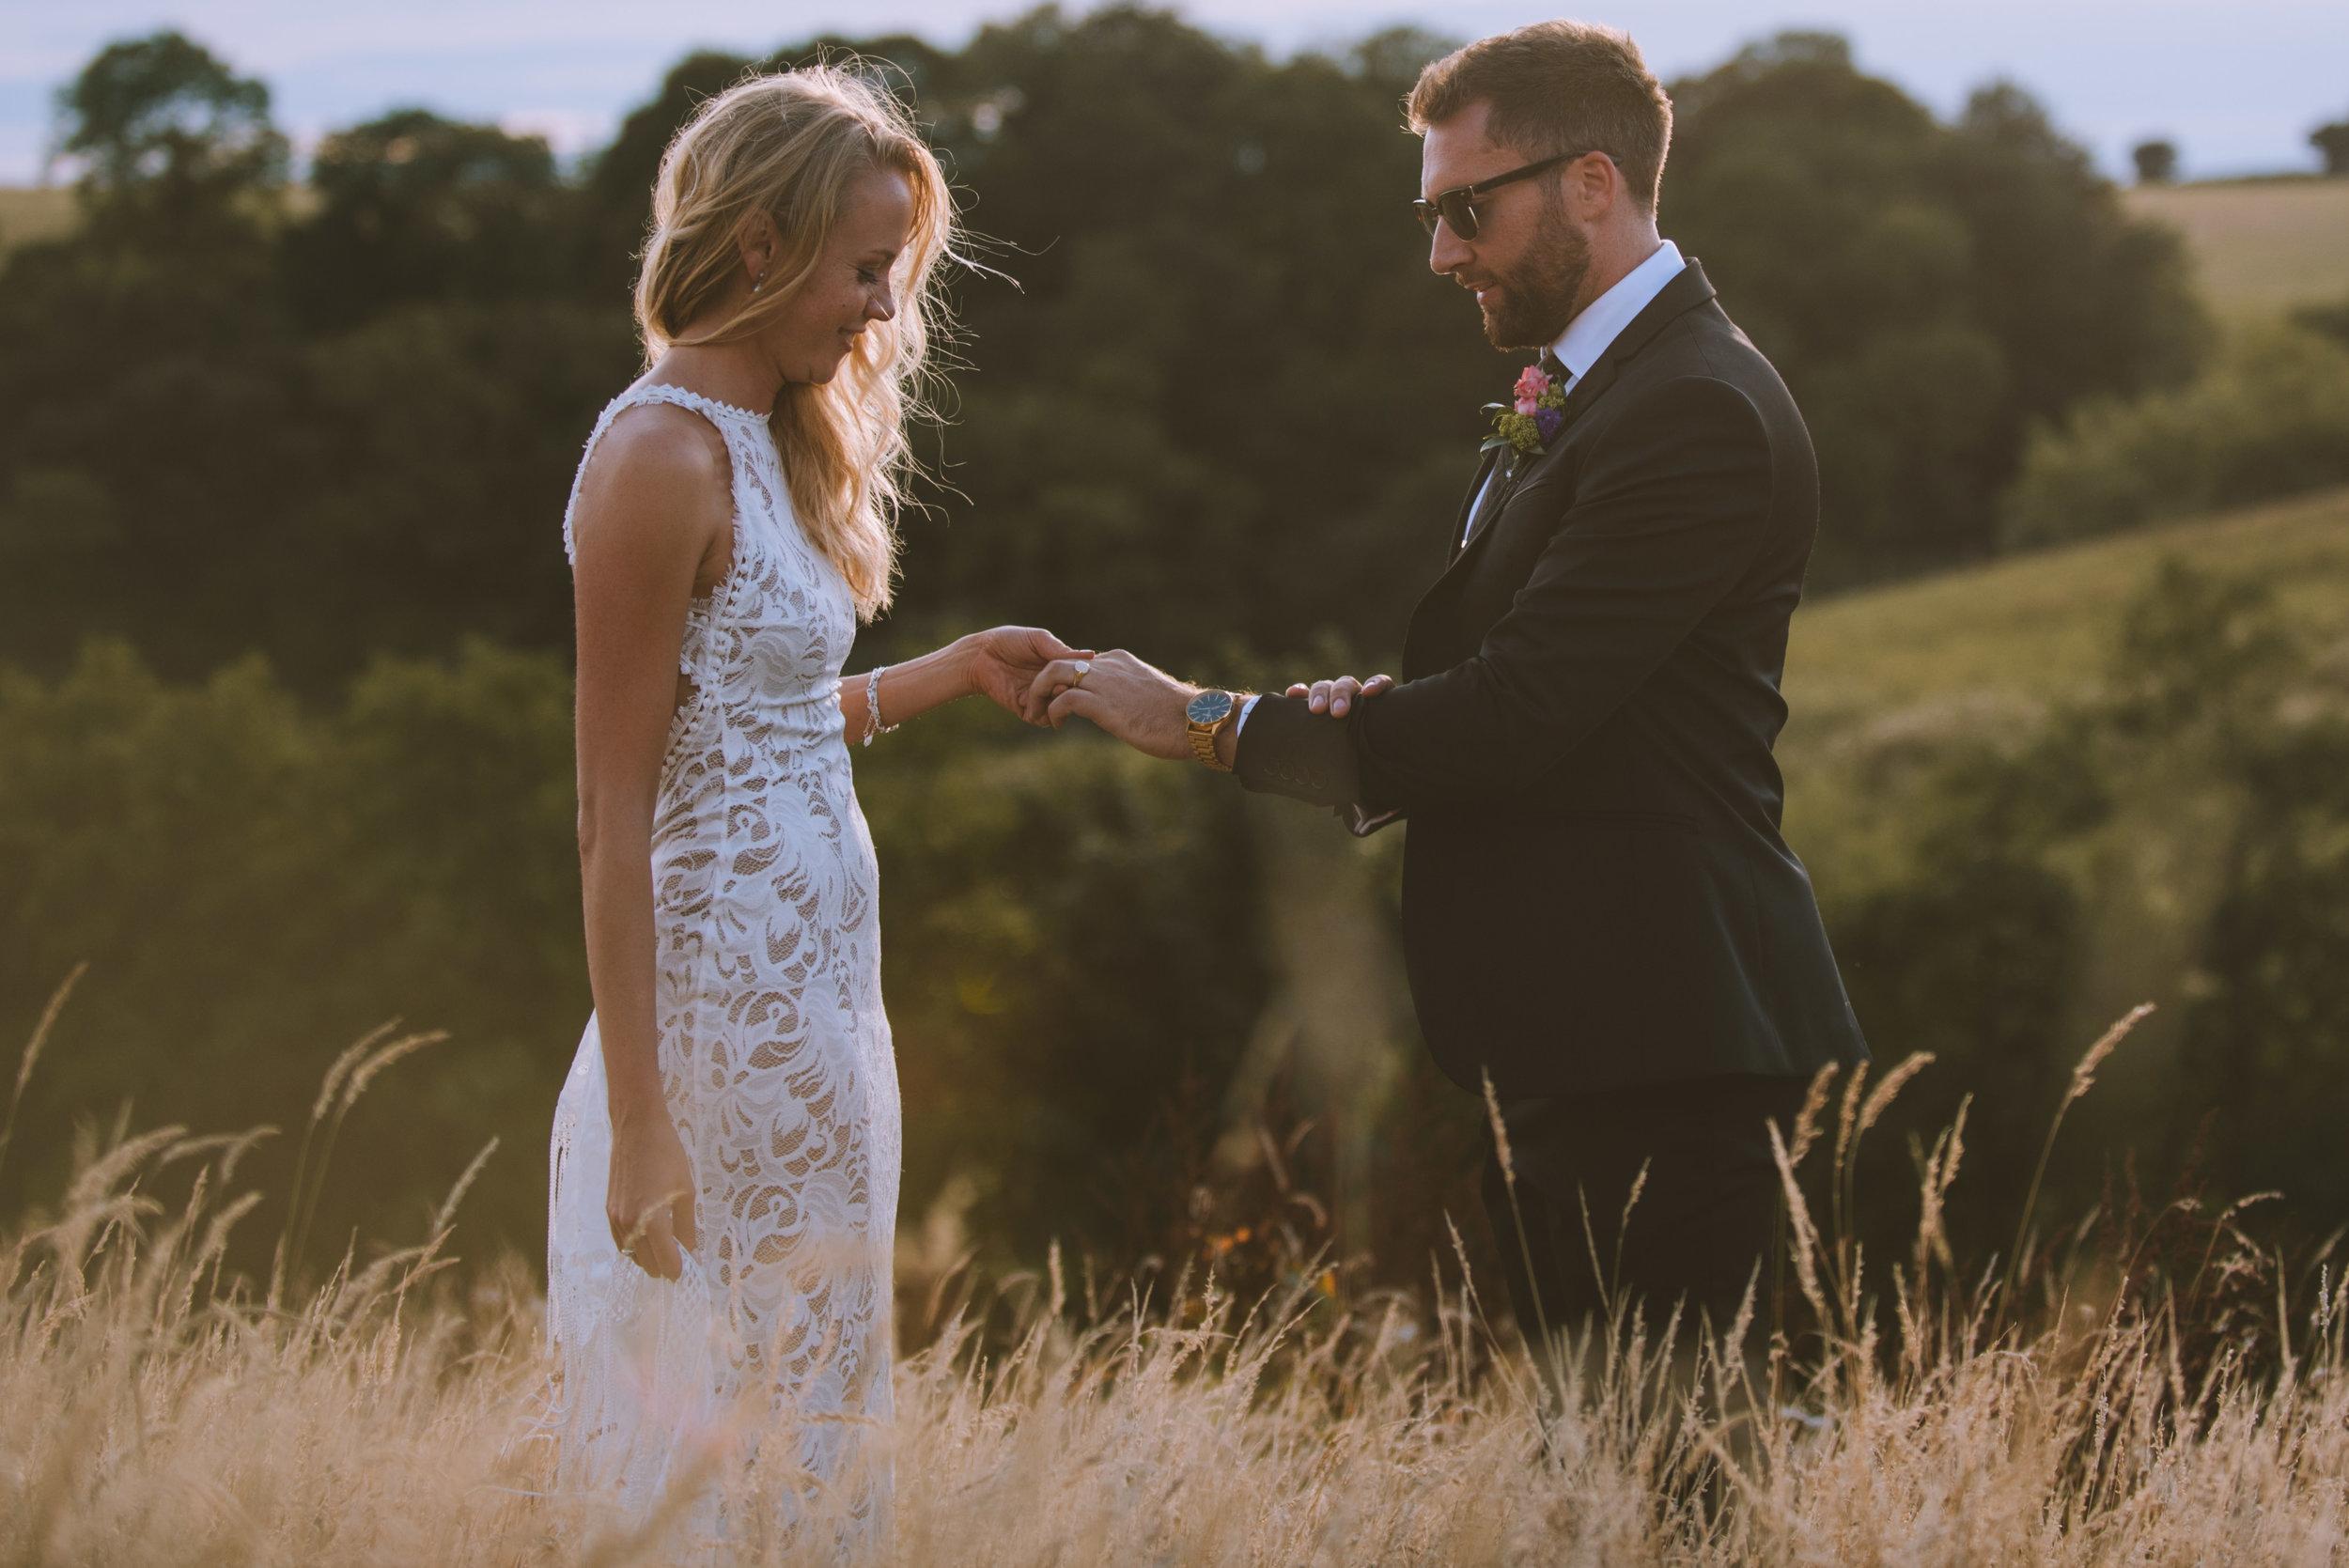 deers-leap-wedding-photographer-124.jpg